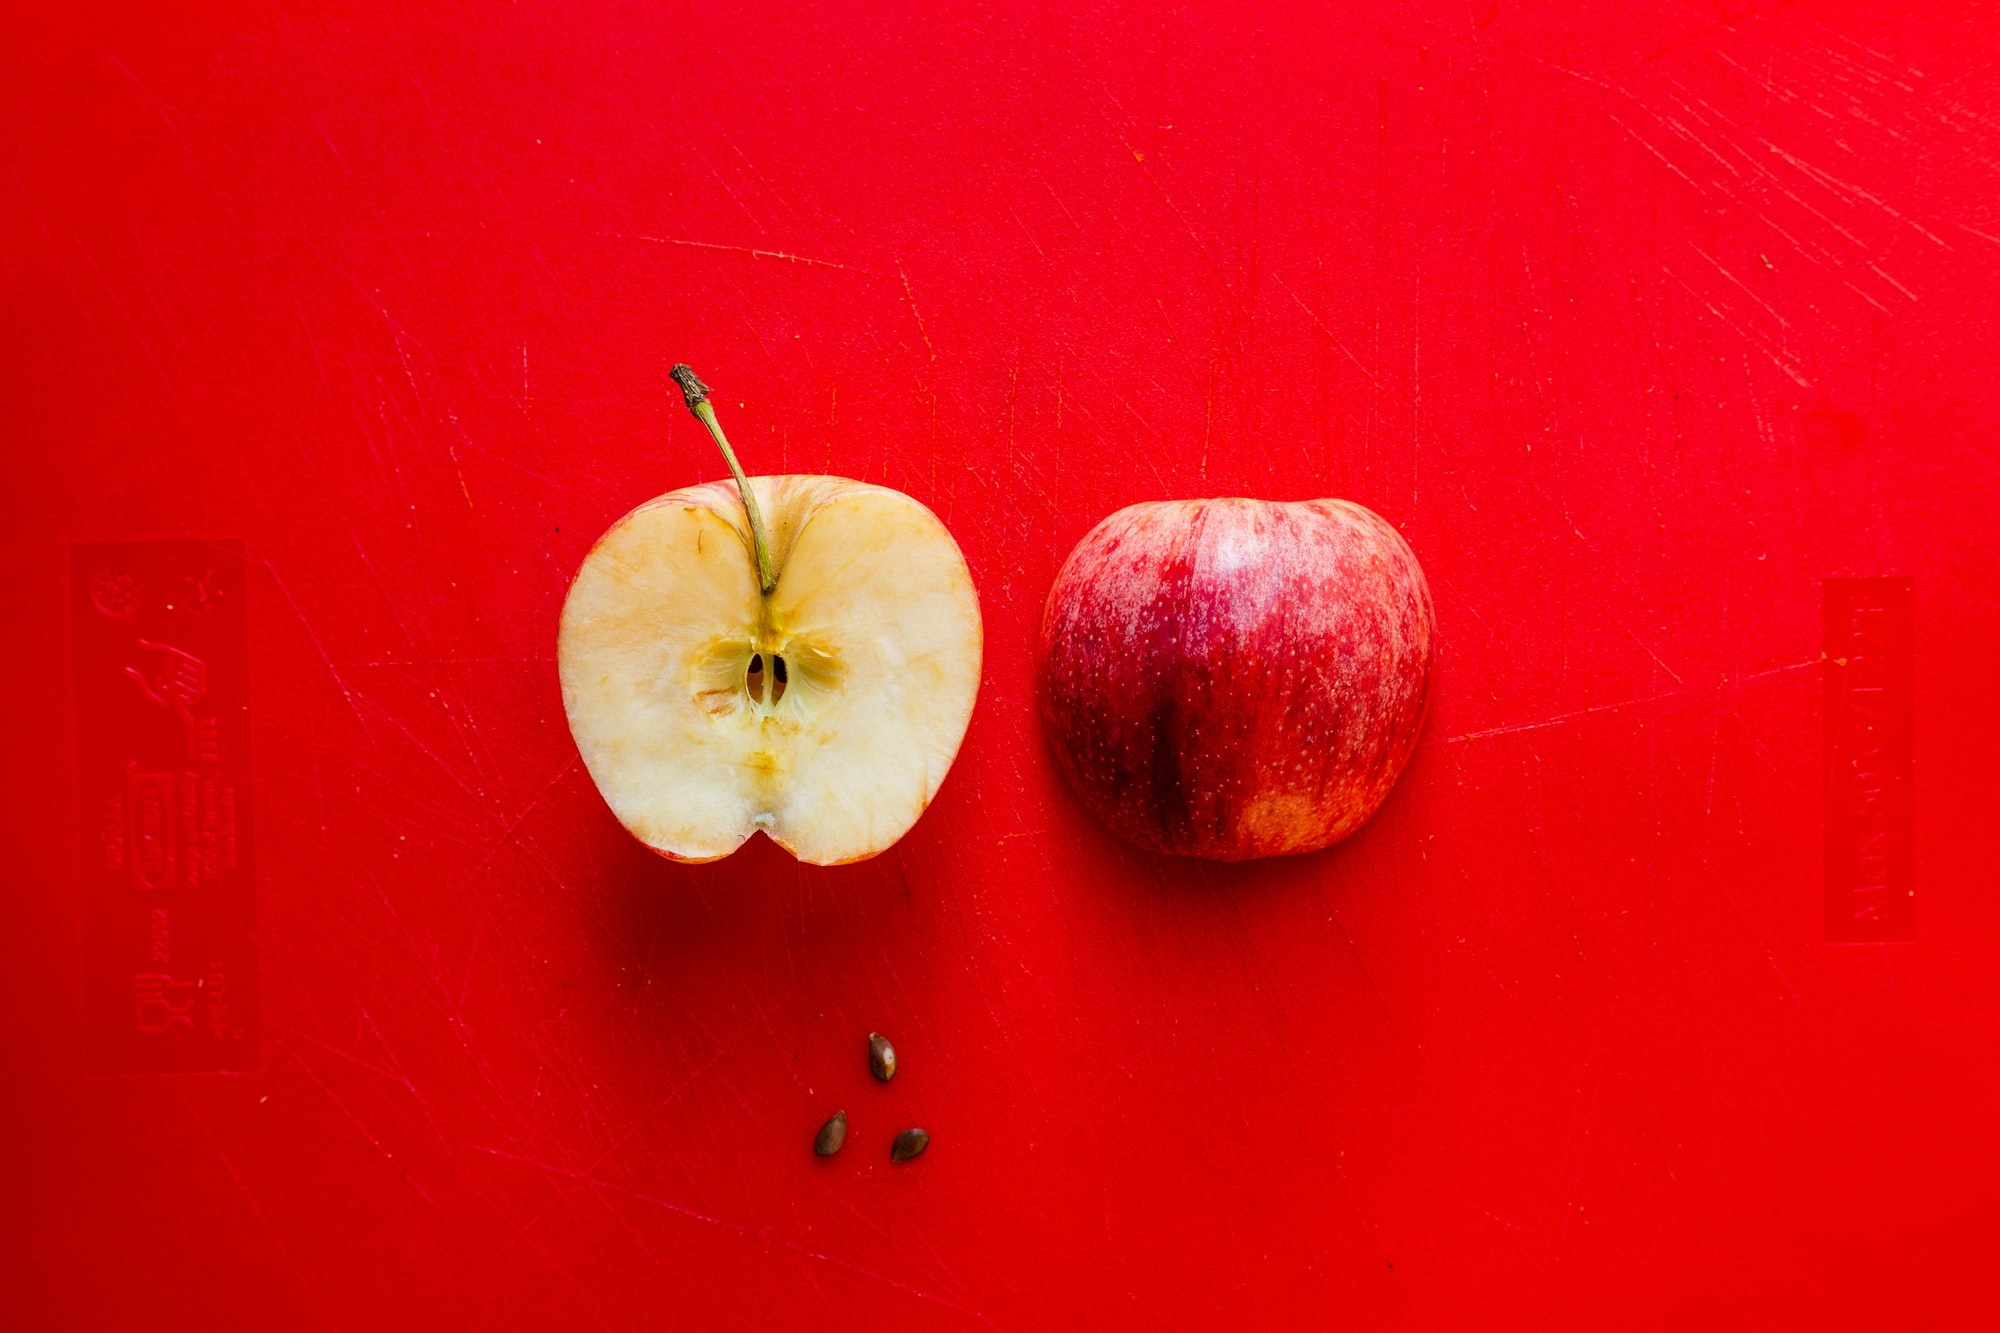 Apple is a superfruit that contains pectin, a prebiotic fiber by Louis Hansel for Unsplash.